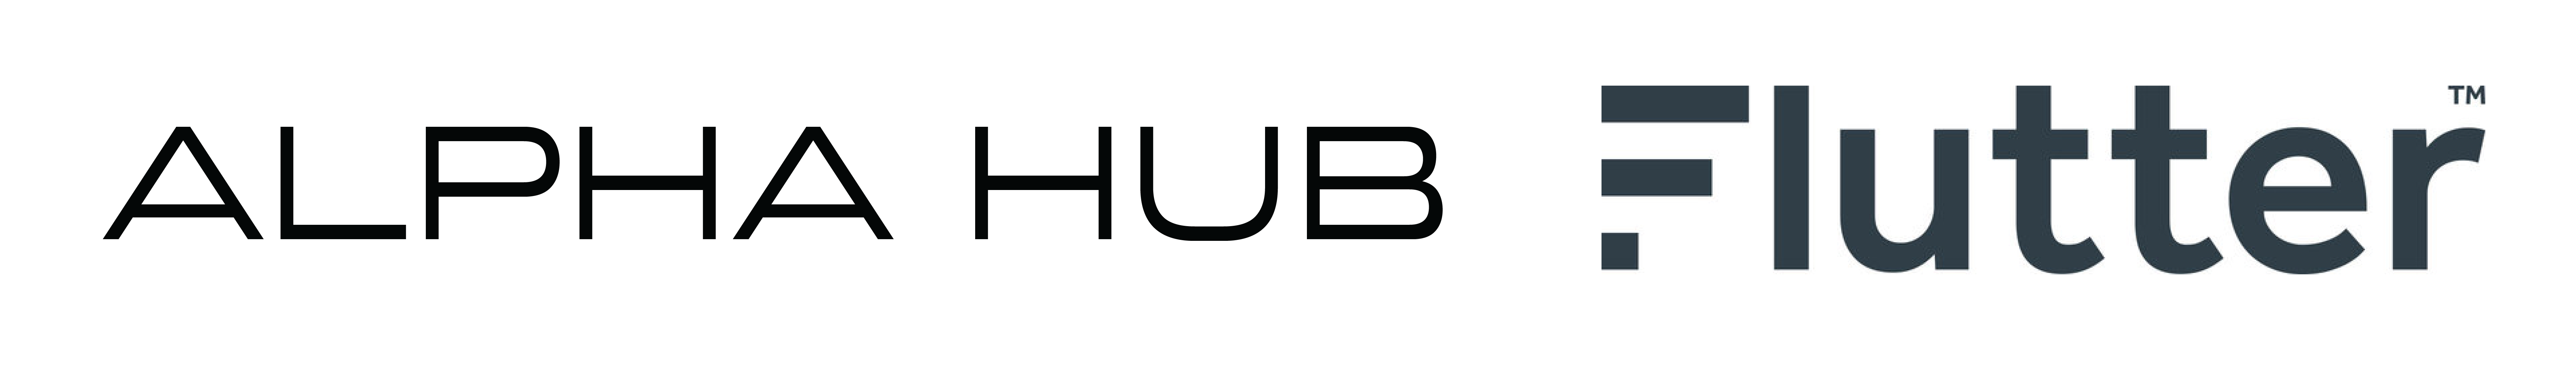 Alpha Hub